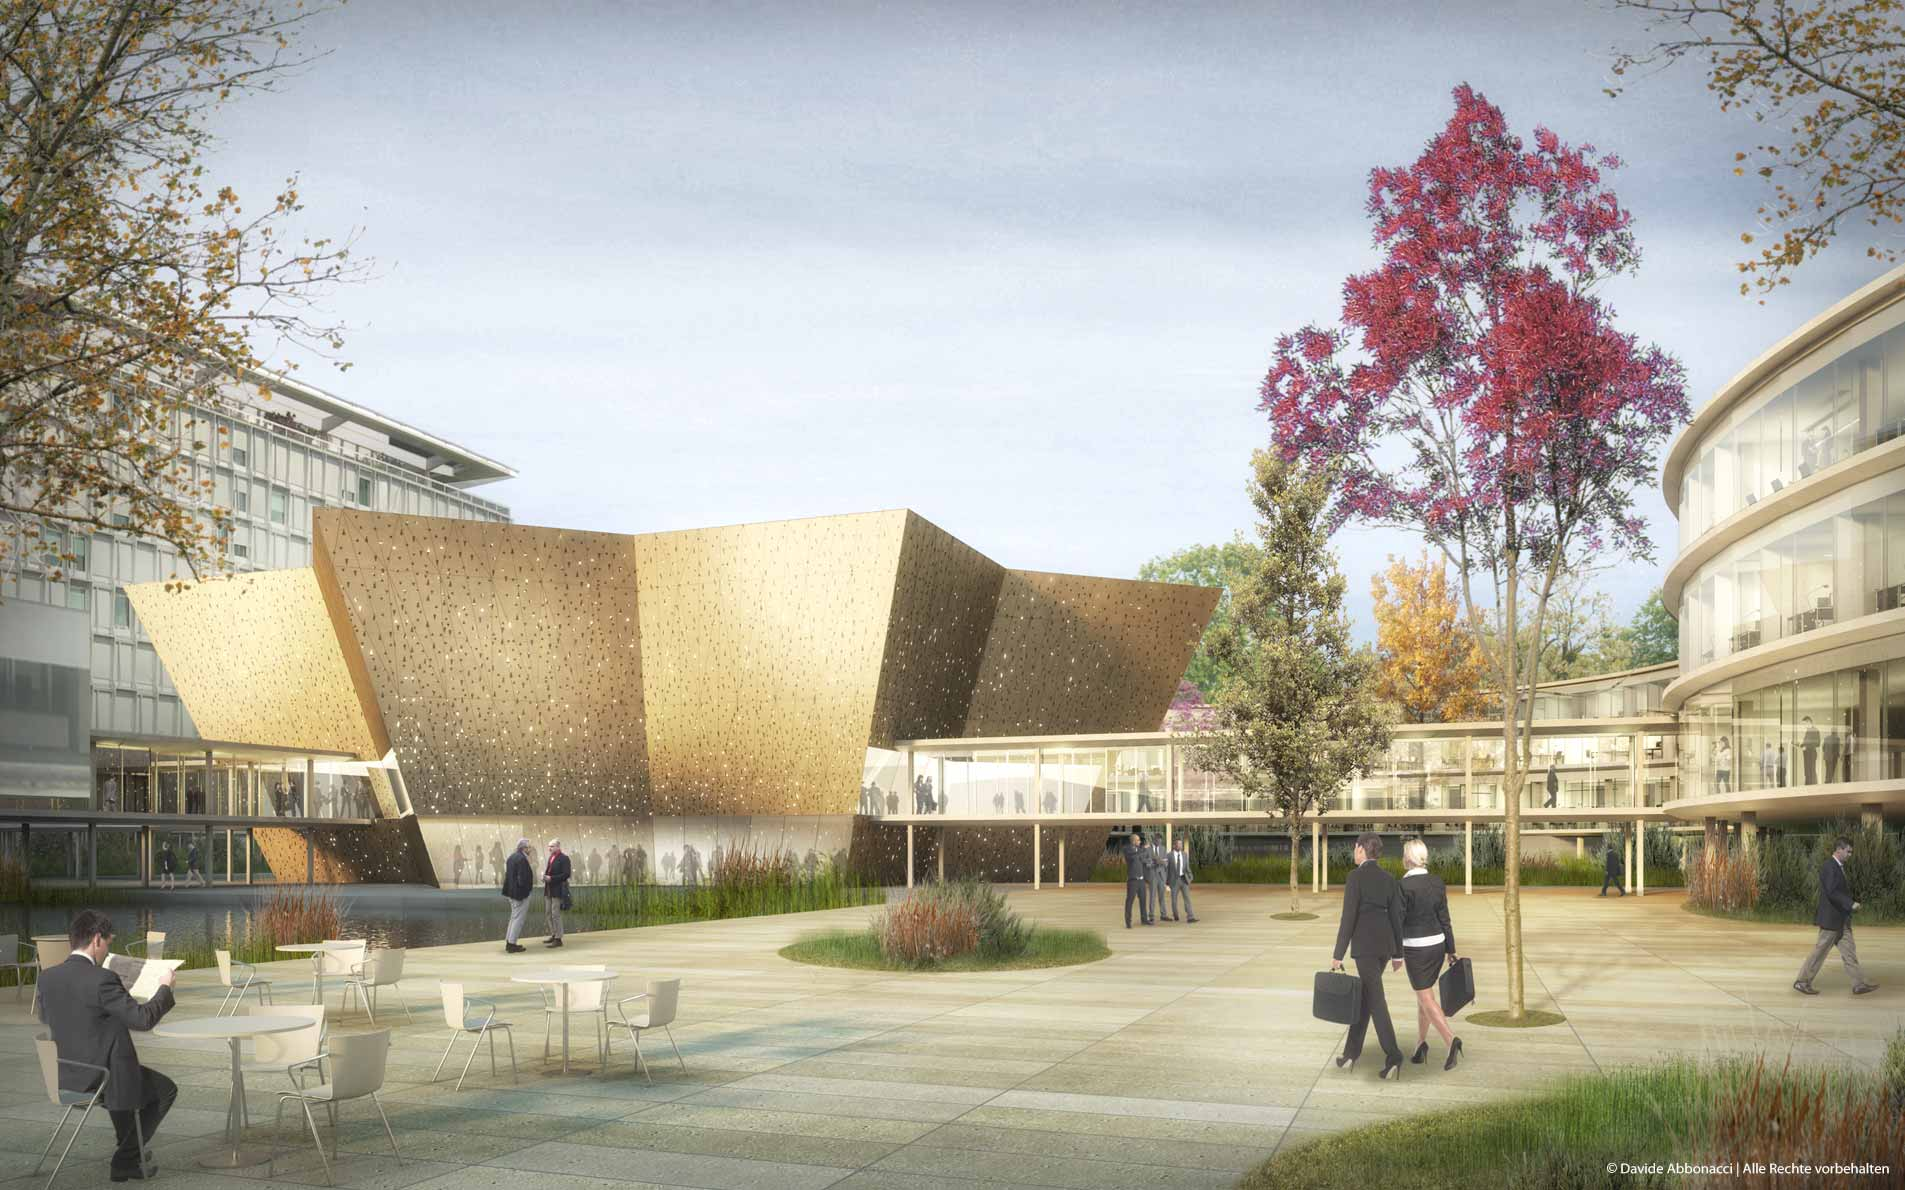 WHO Headquarters Building Extension, Geneva - Switzerland | Adjaye Associates  | 2014 Wettbewerbsvisualisierung